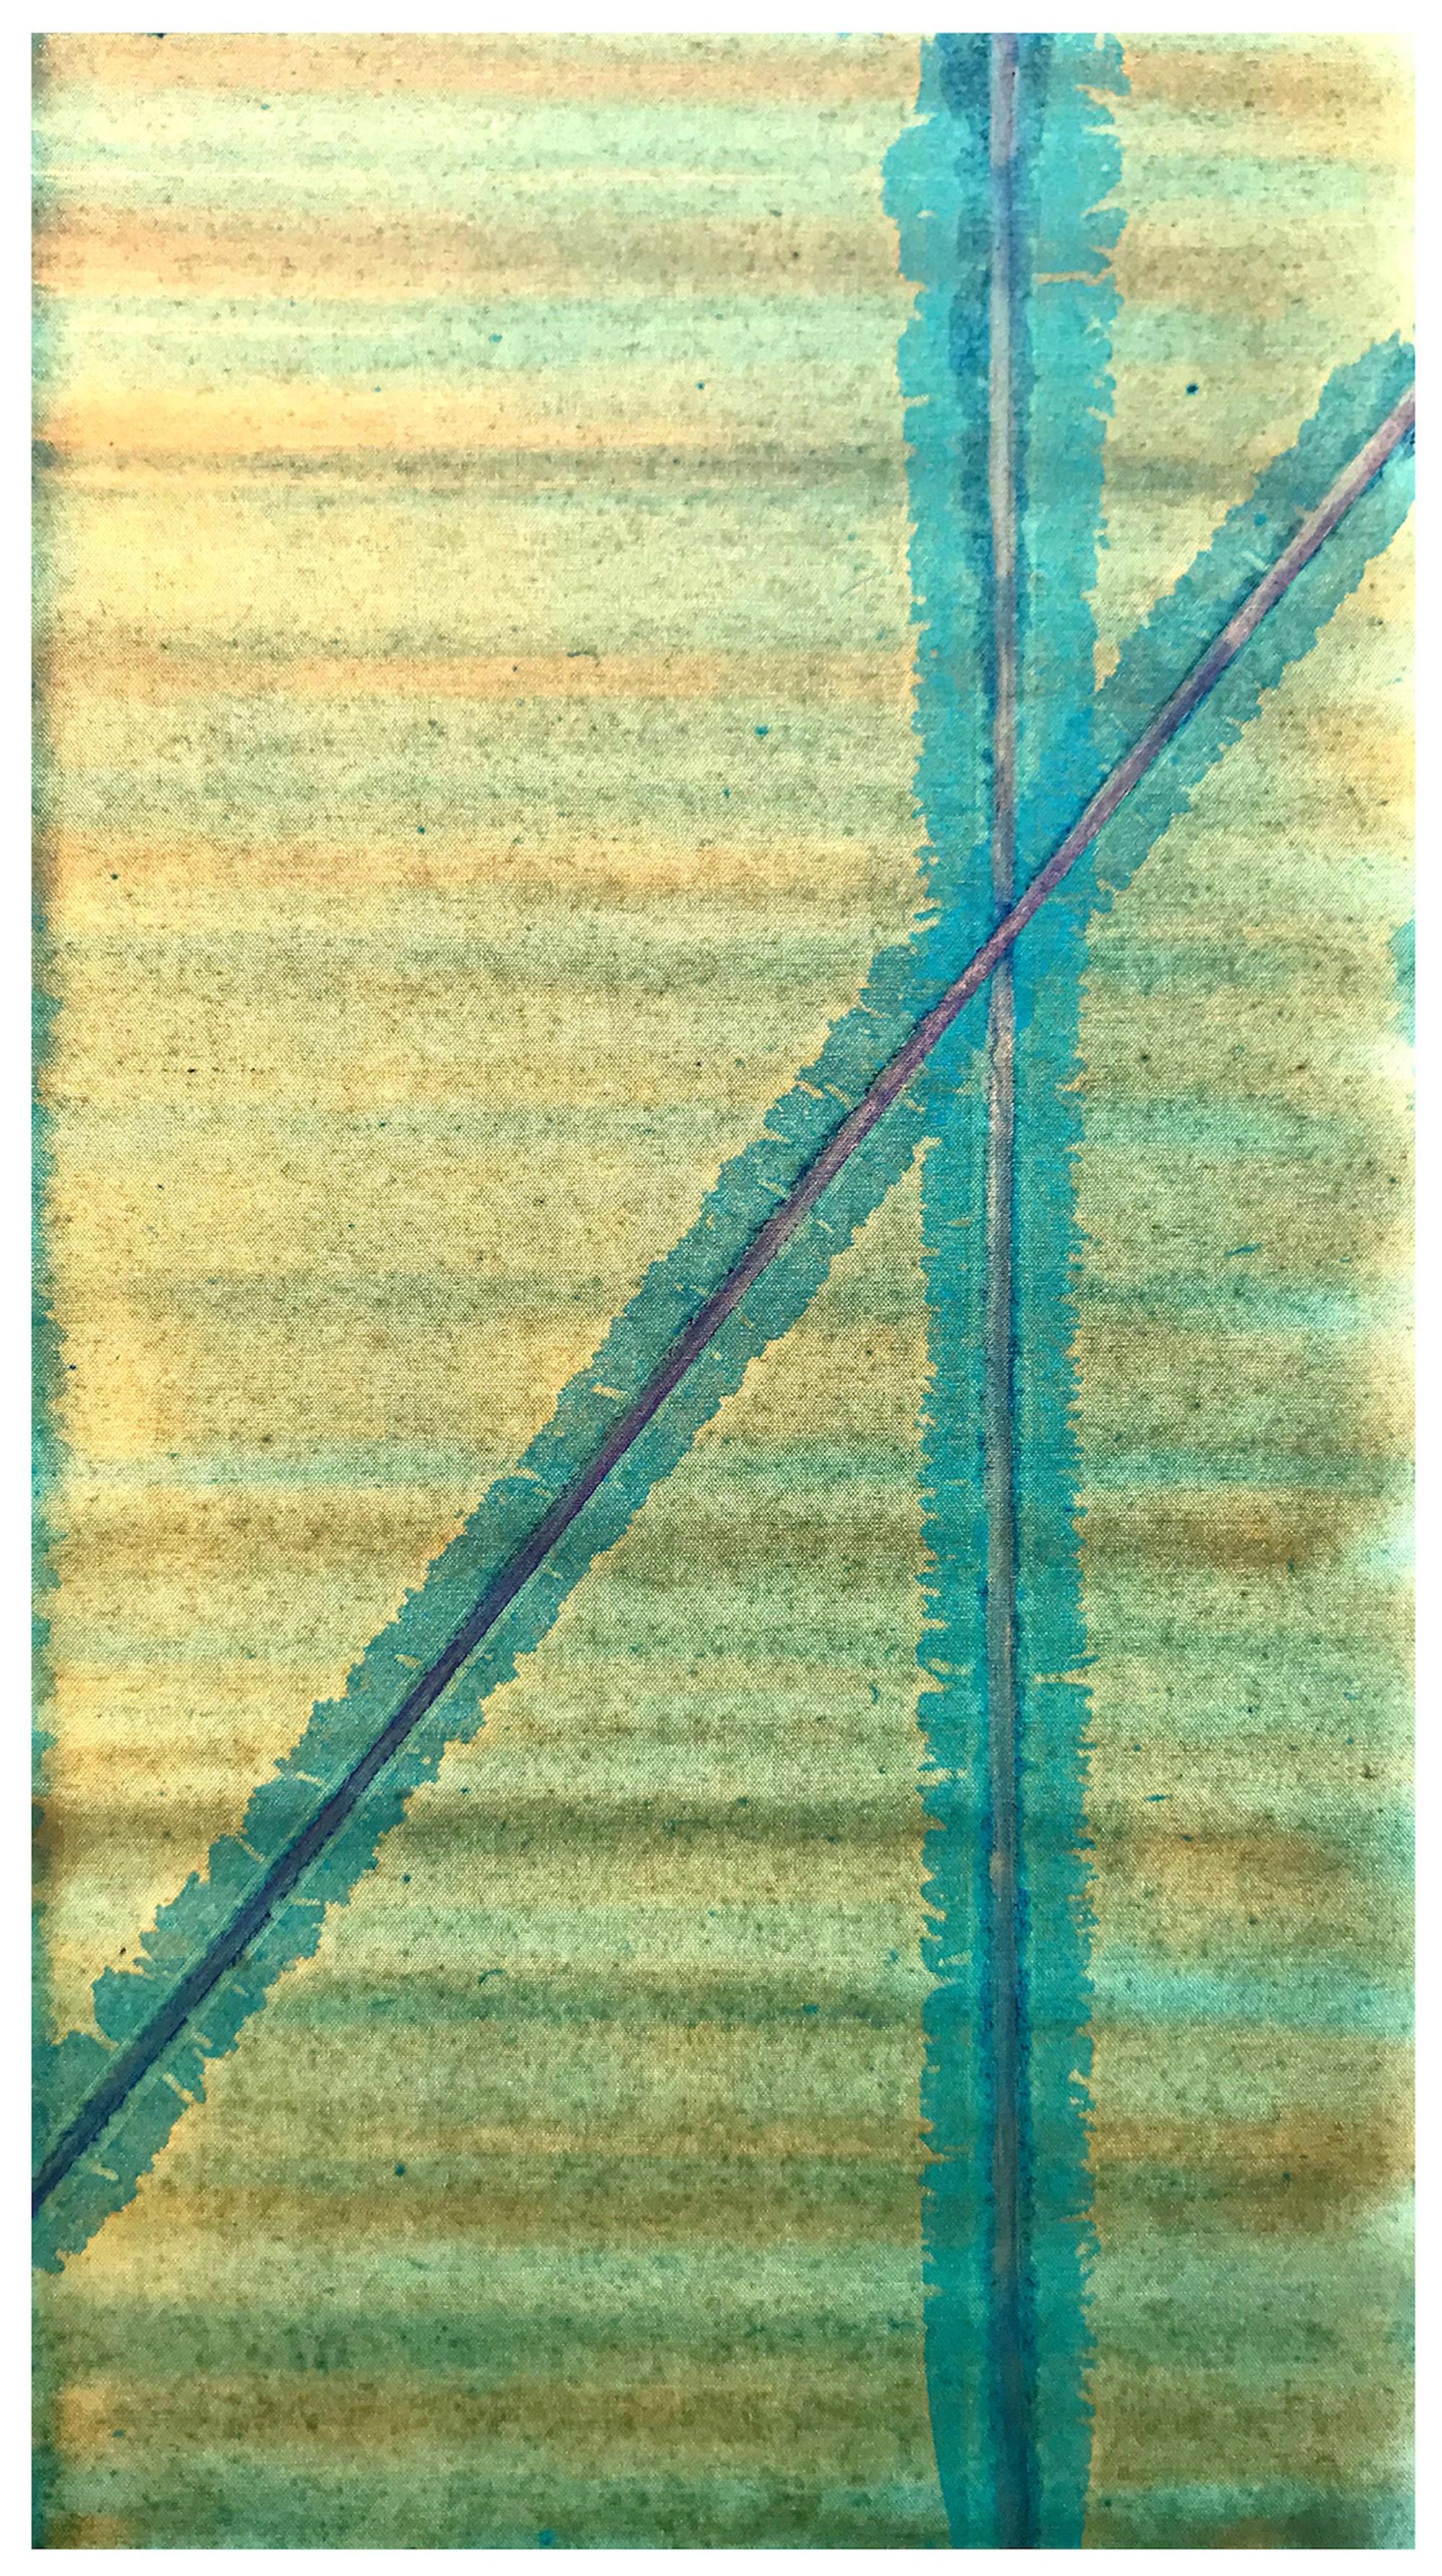 Crossed Signals II by Steven Anton Rehage